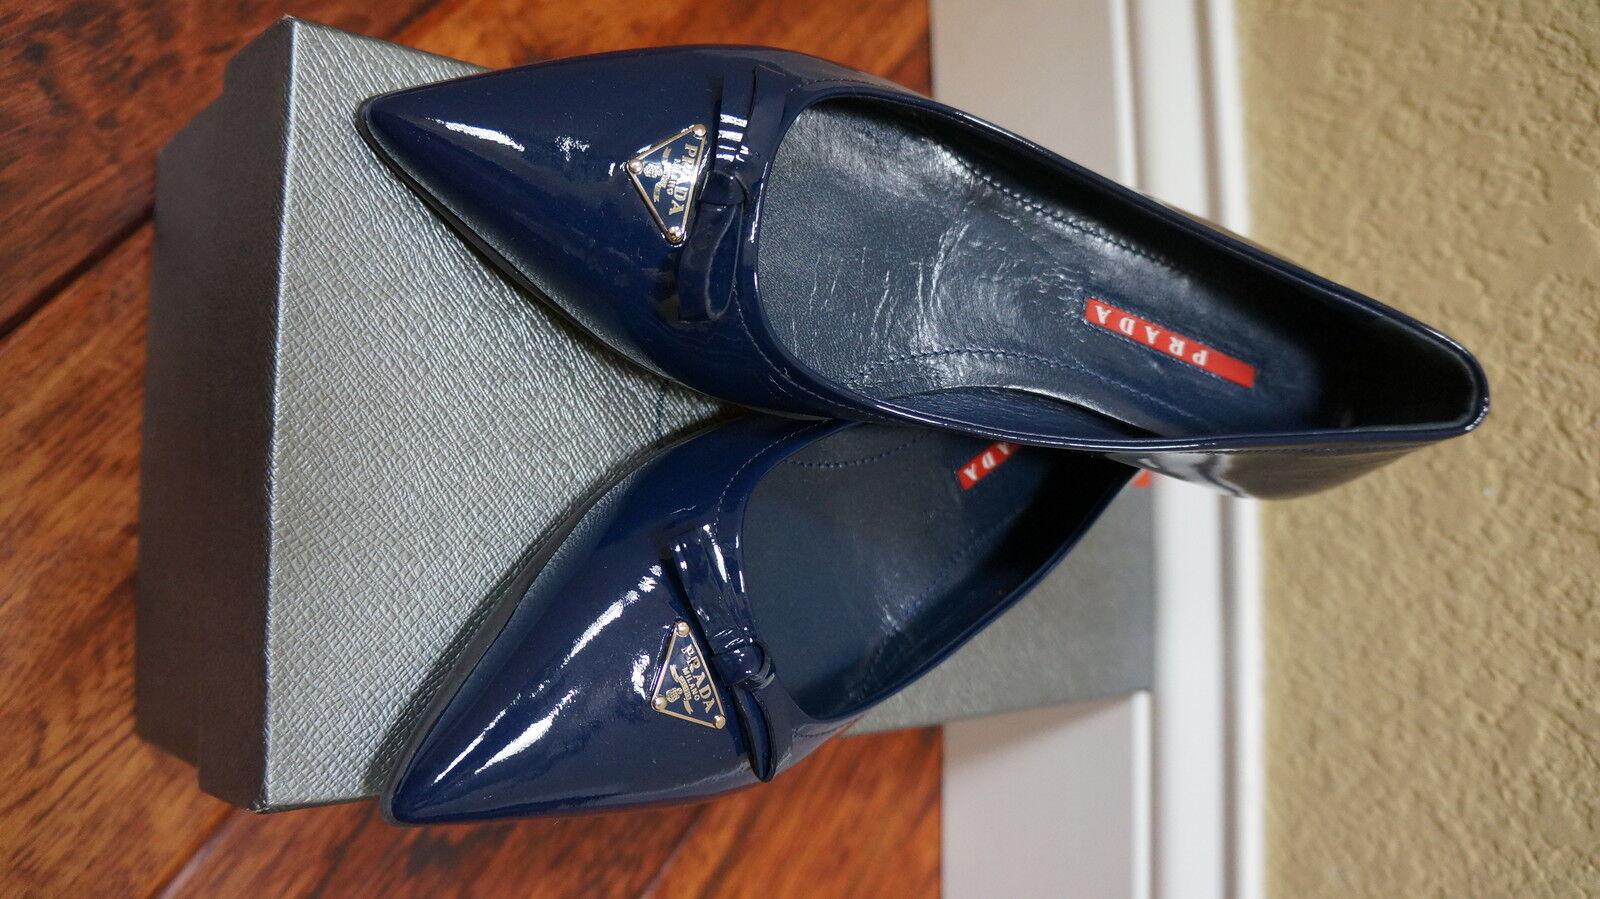 450 450 450 NIB Prada Prada Prada Pelle Ballet Flats Royal blu 35.5EU 5.5US 36   68cc88